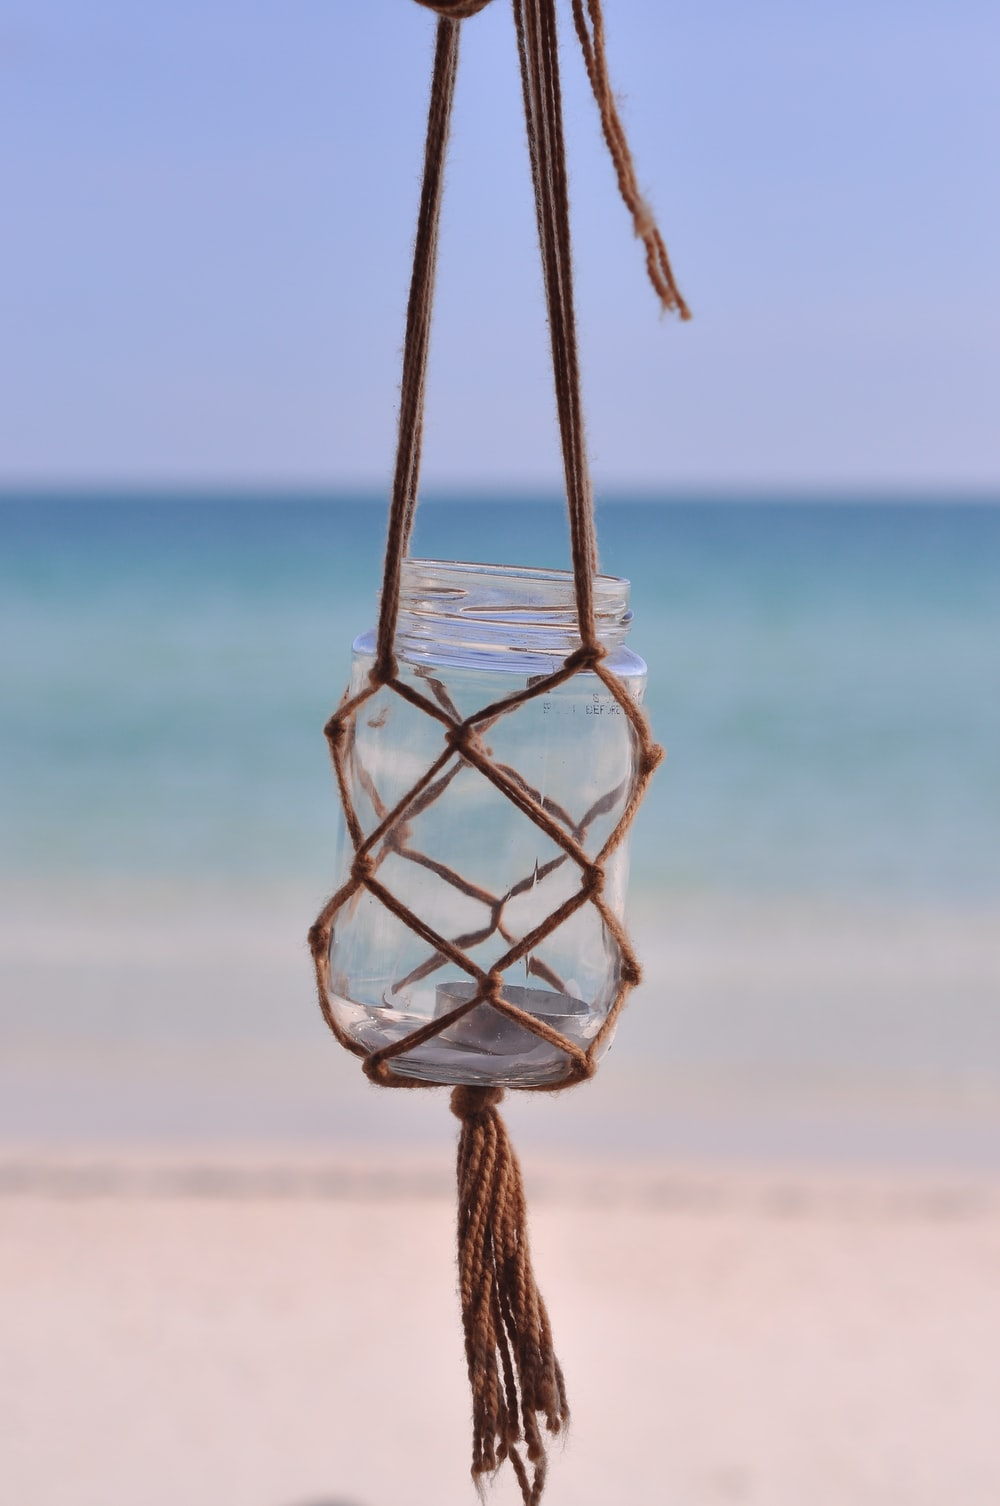 brown wooden basketball hoop on beach during daytime